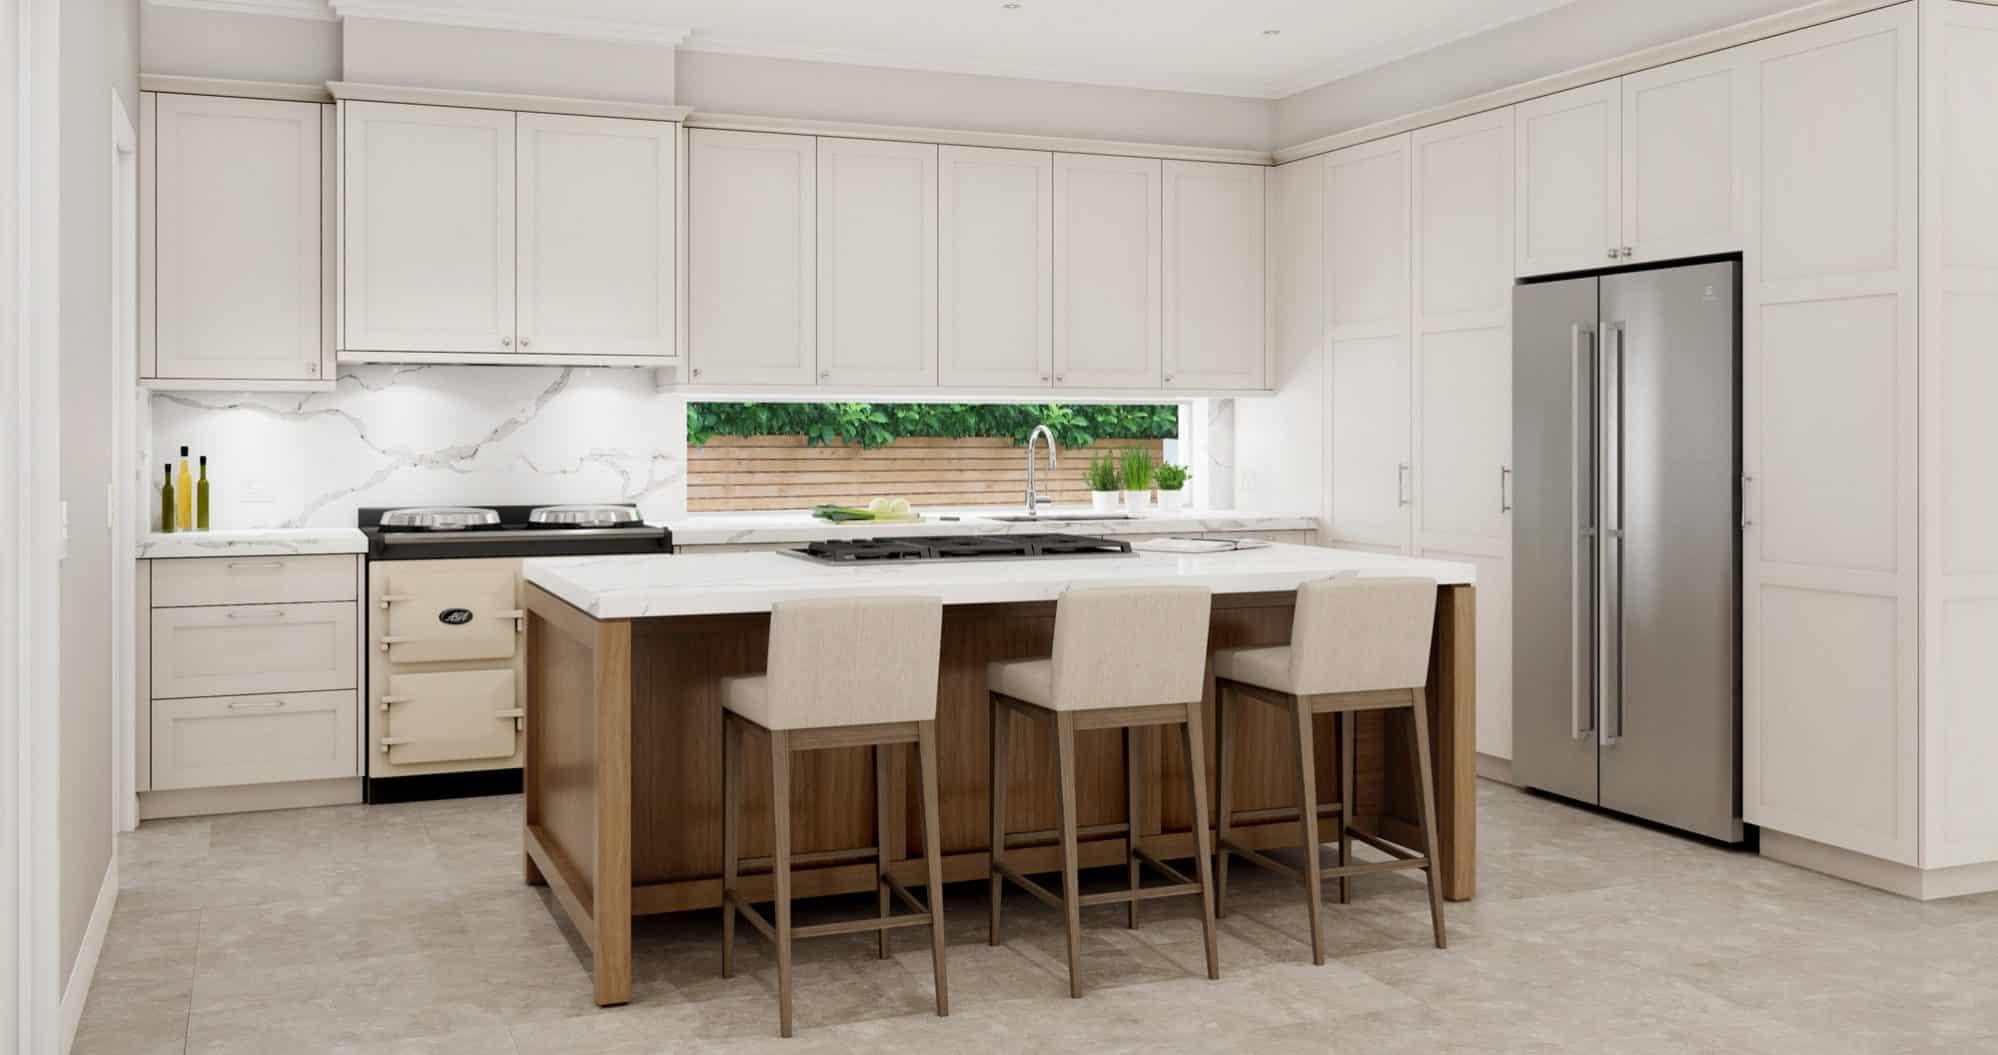 Transitional Kitchen Designs Designer Kitchens Dan Kitchens